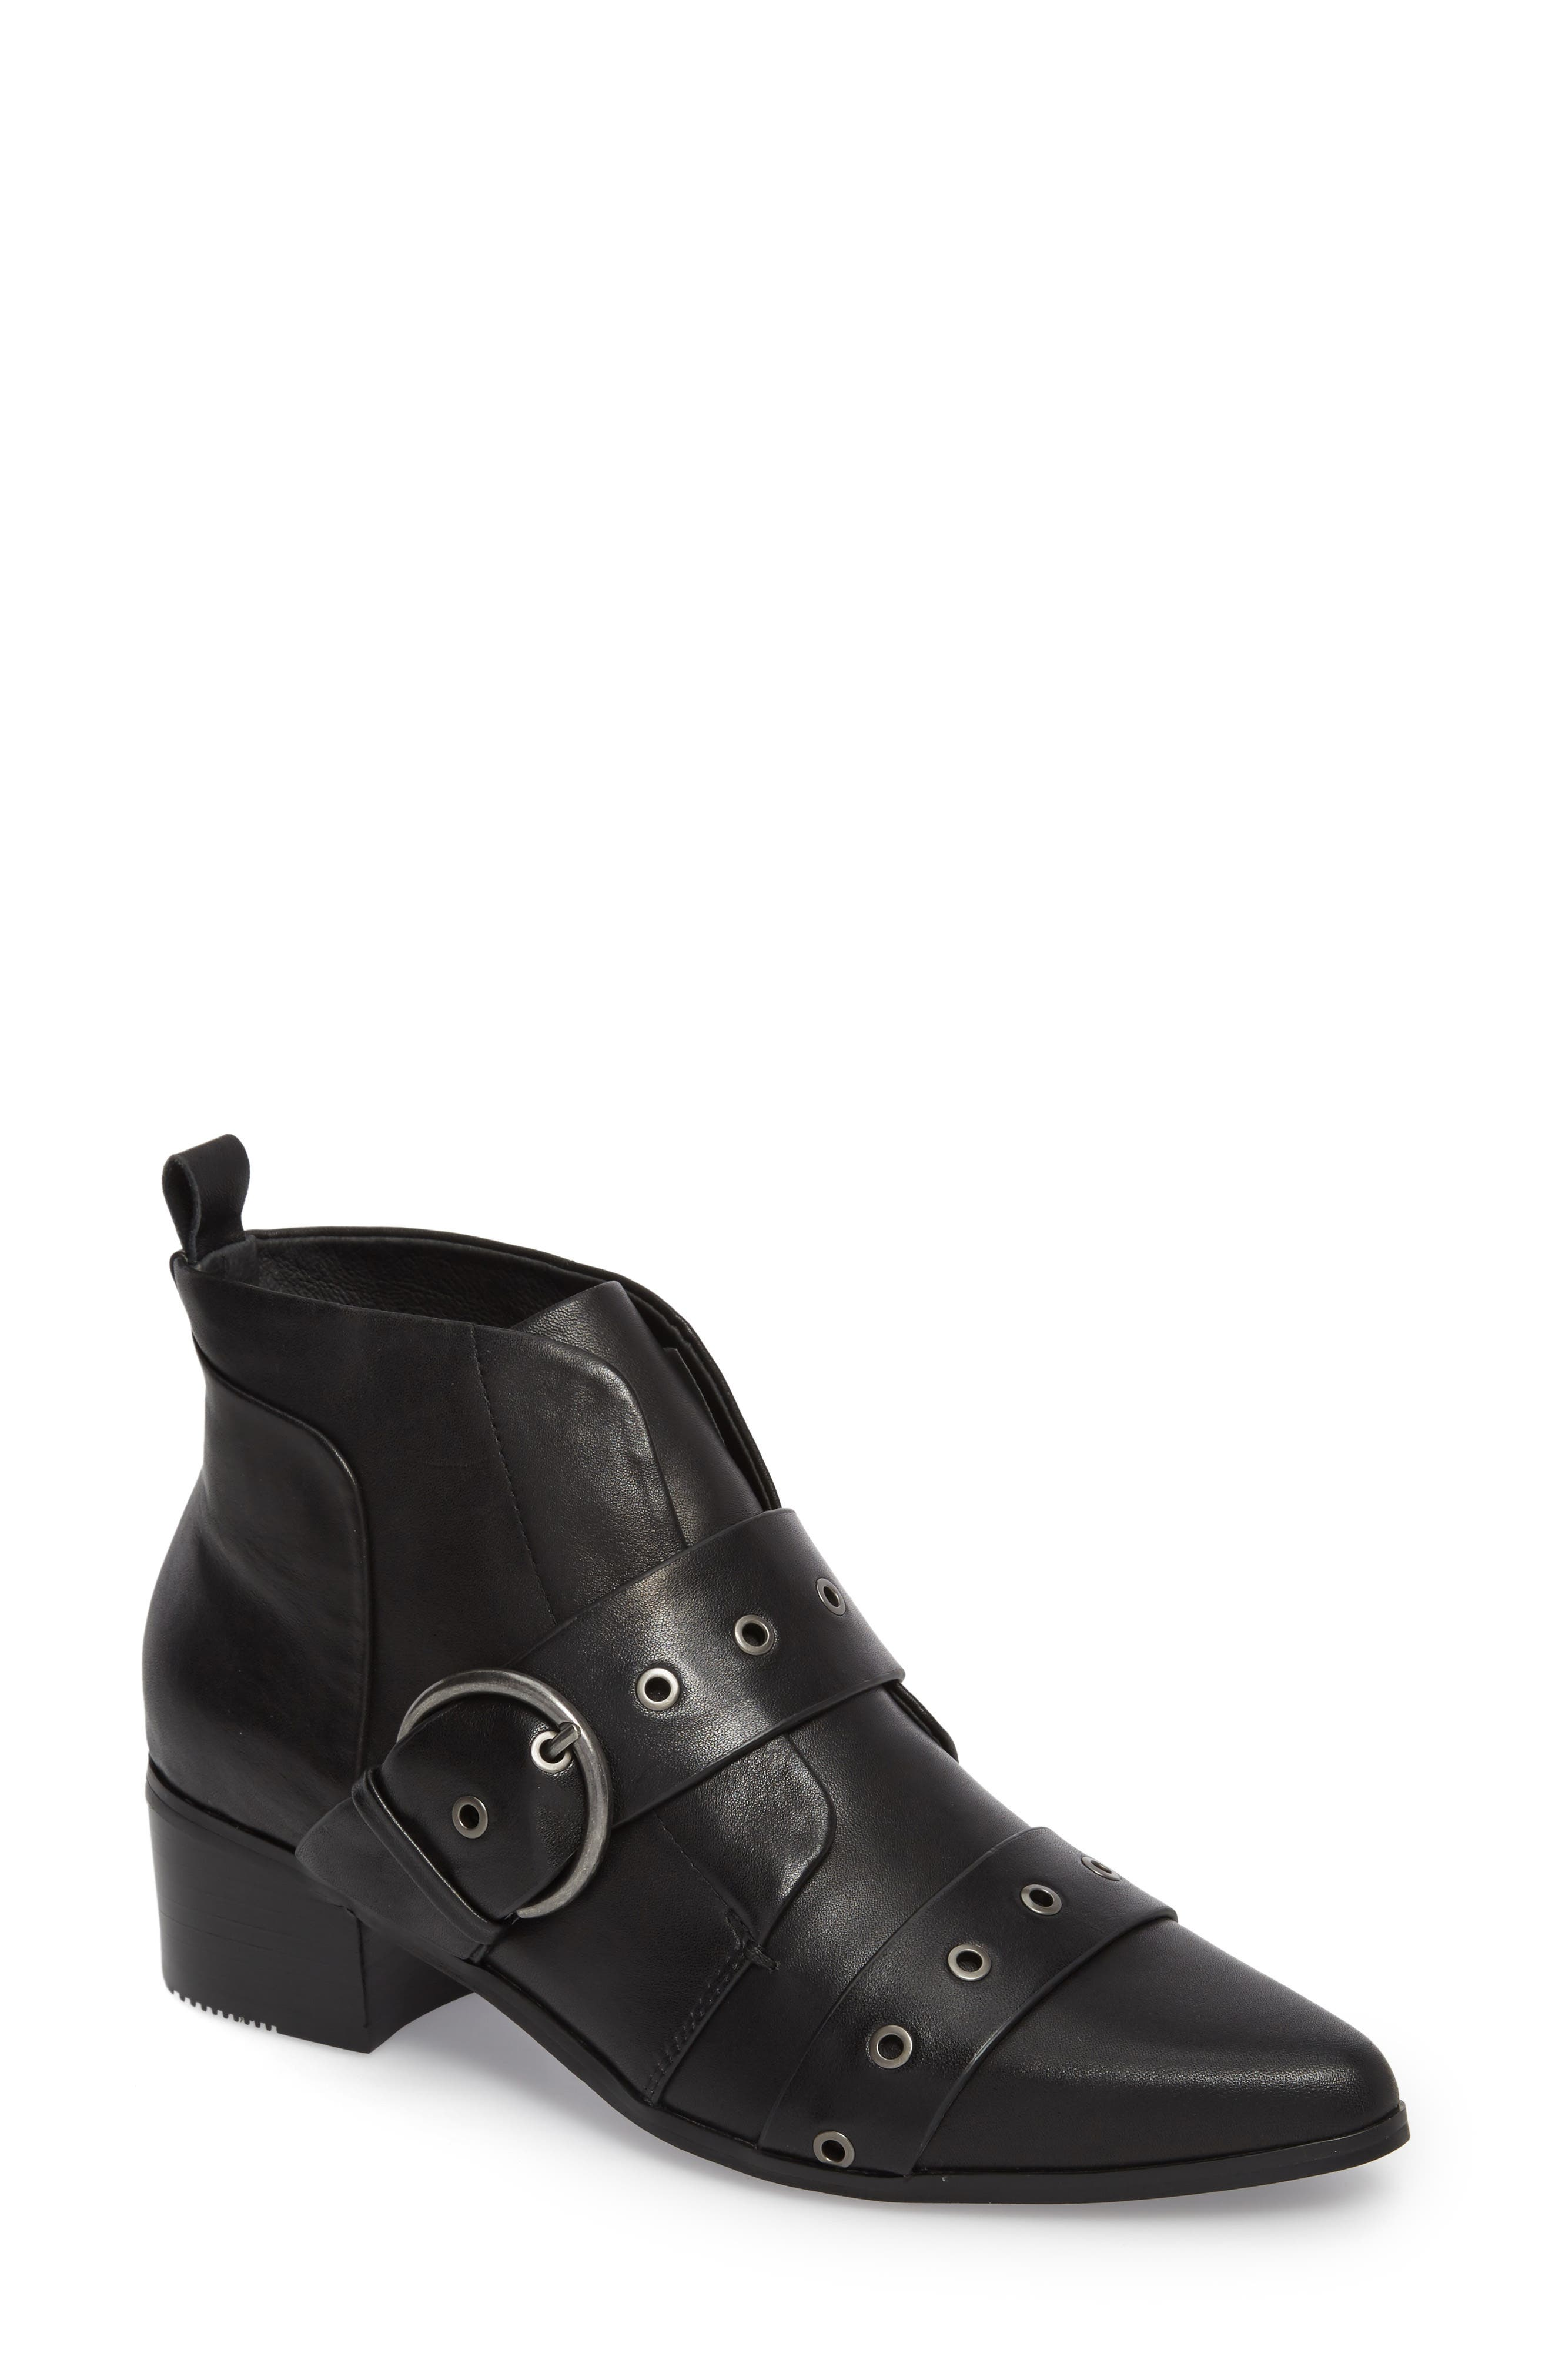 Buckle Strap Bootie,                             Main thumbnail 1, color,                             Black Leather